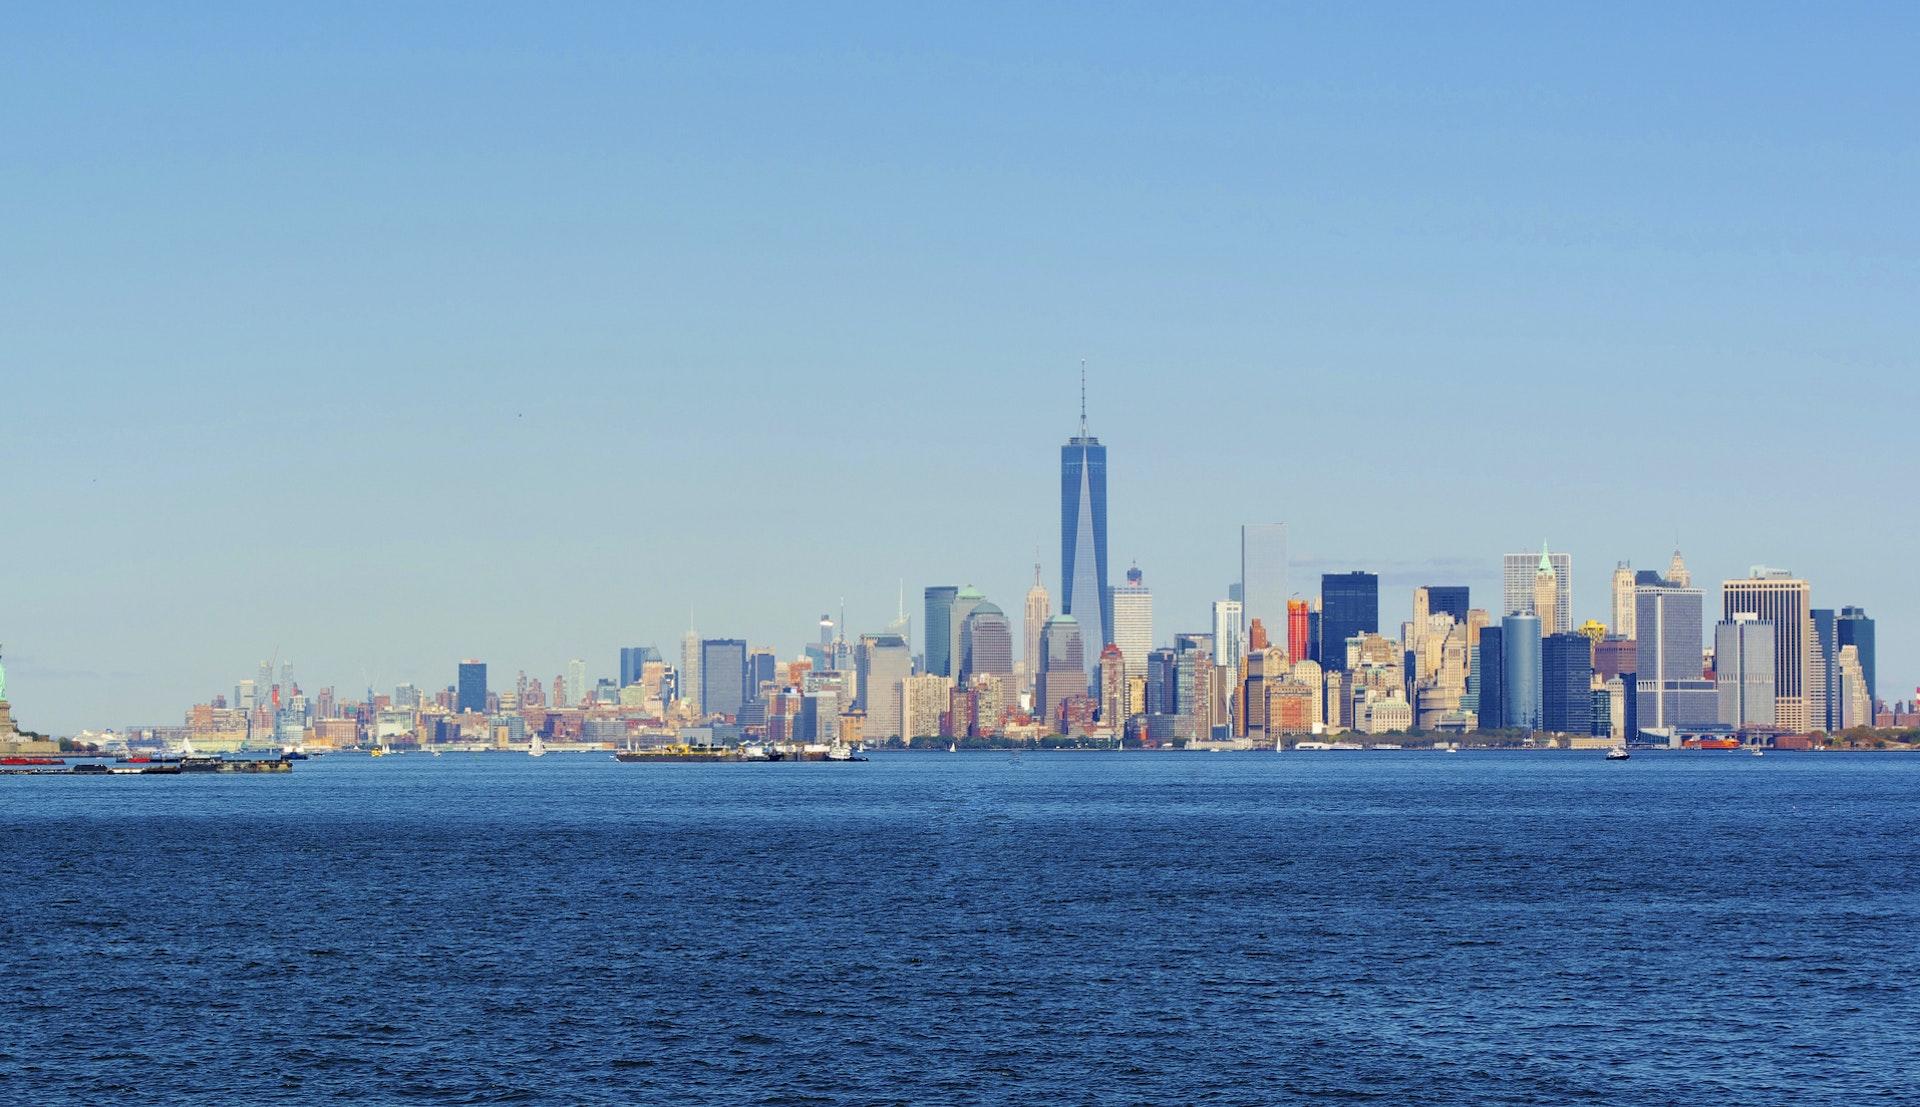 Manhattan Skyline © Luke Abrahams, Getty Images